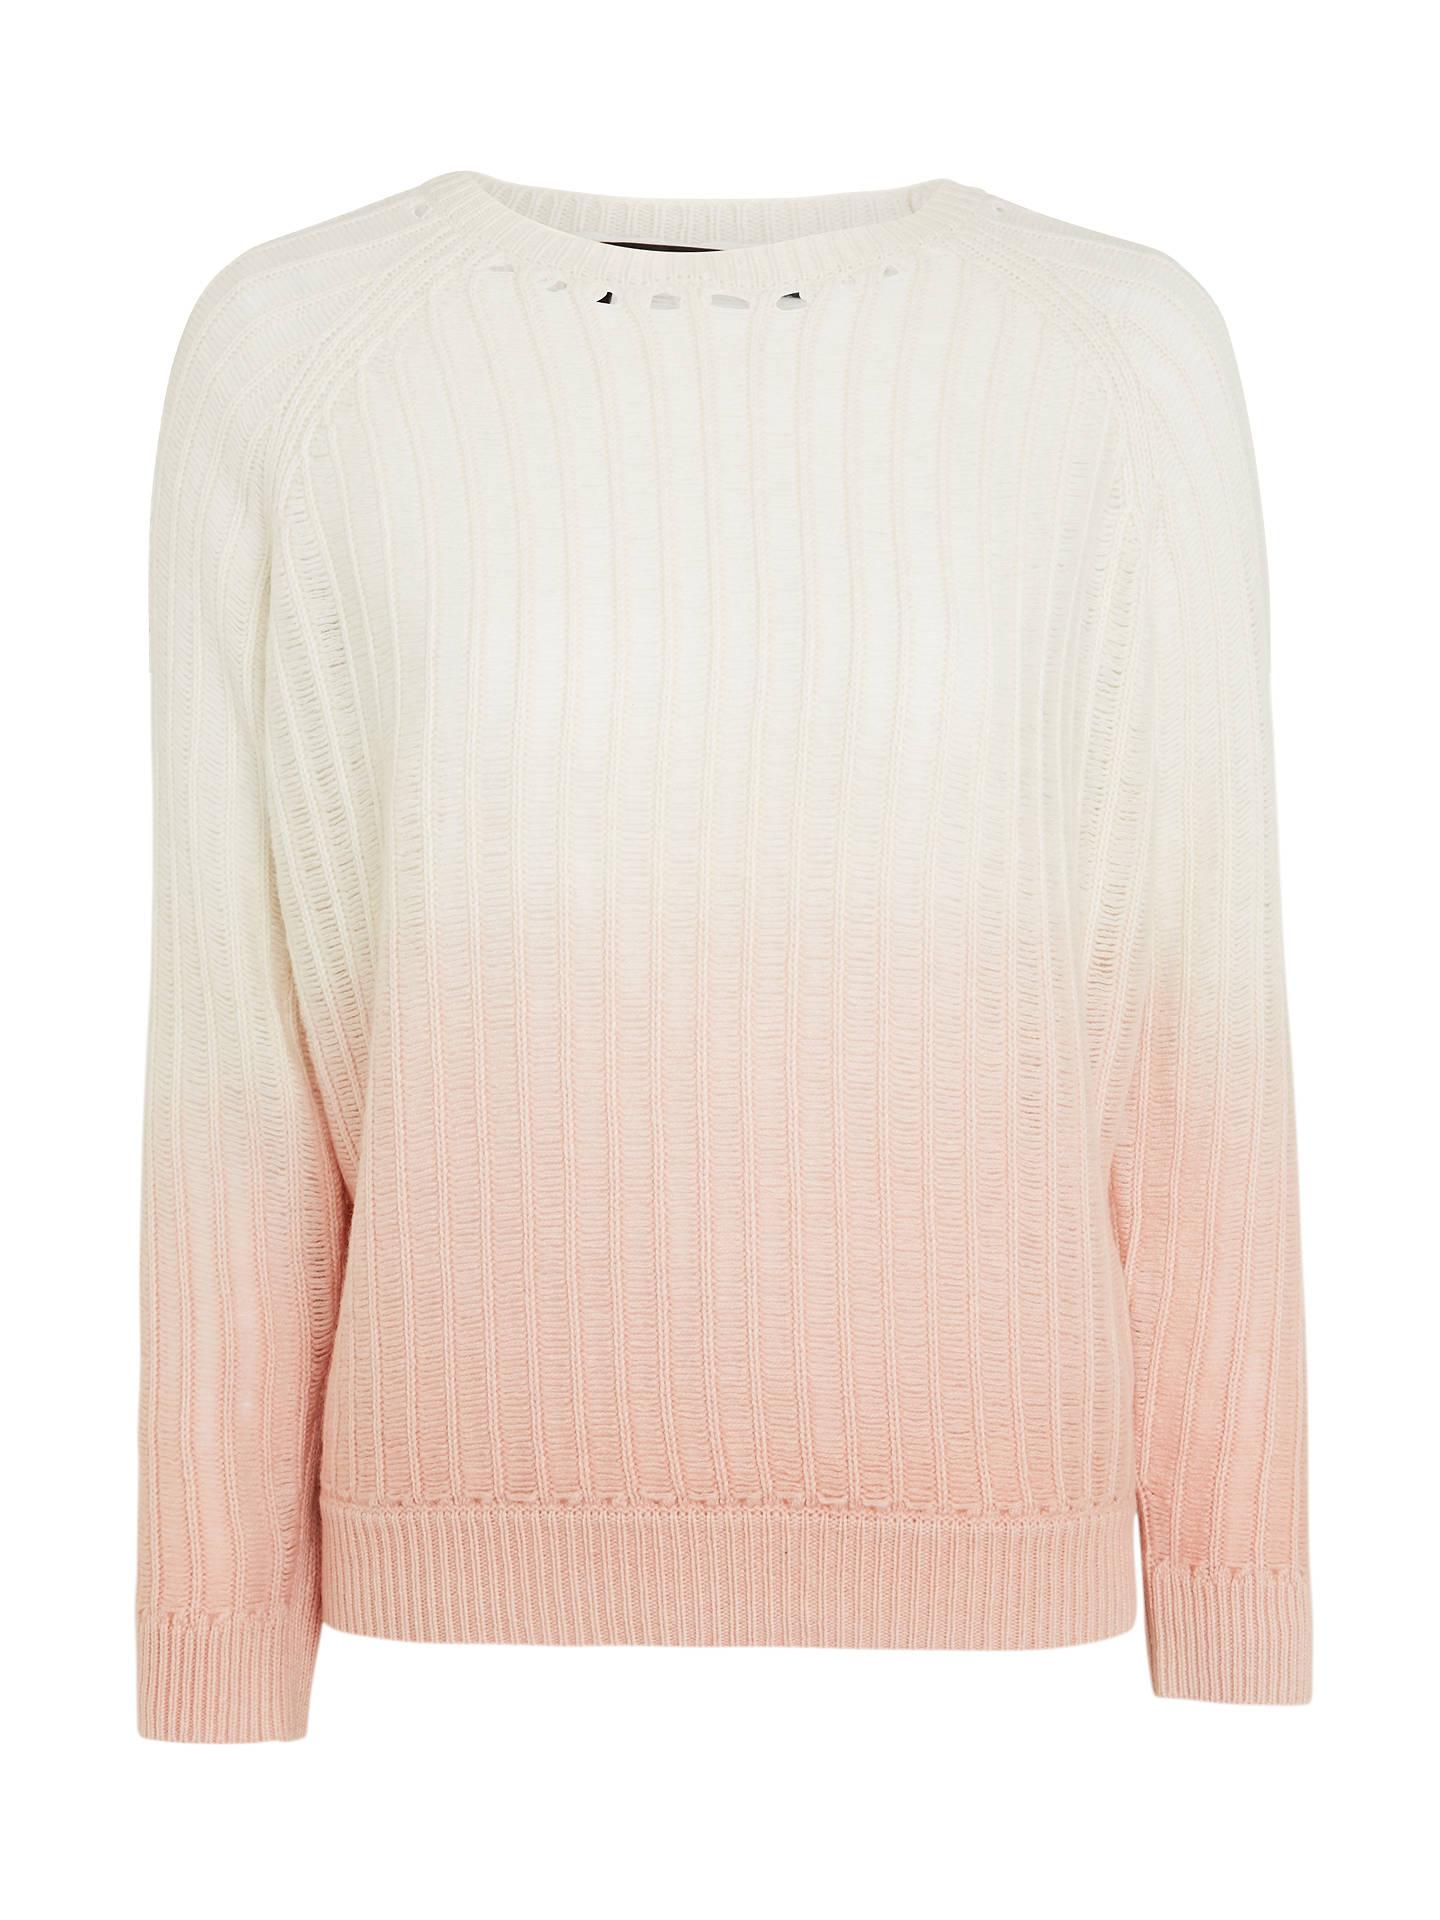 360 Sweater Demi Dip Dye Cashmere Jumper, ChalkRose at John